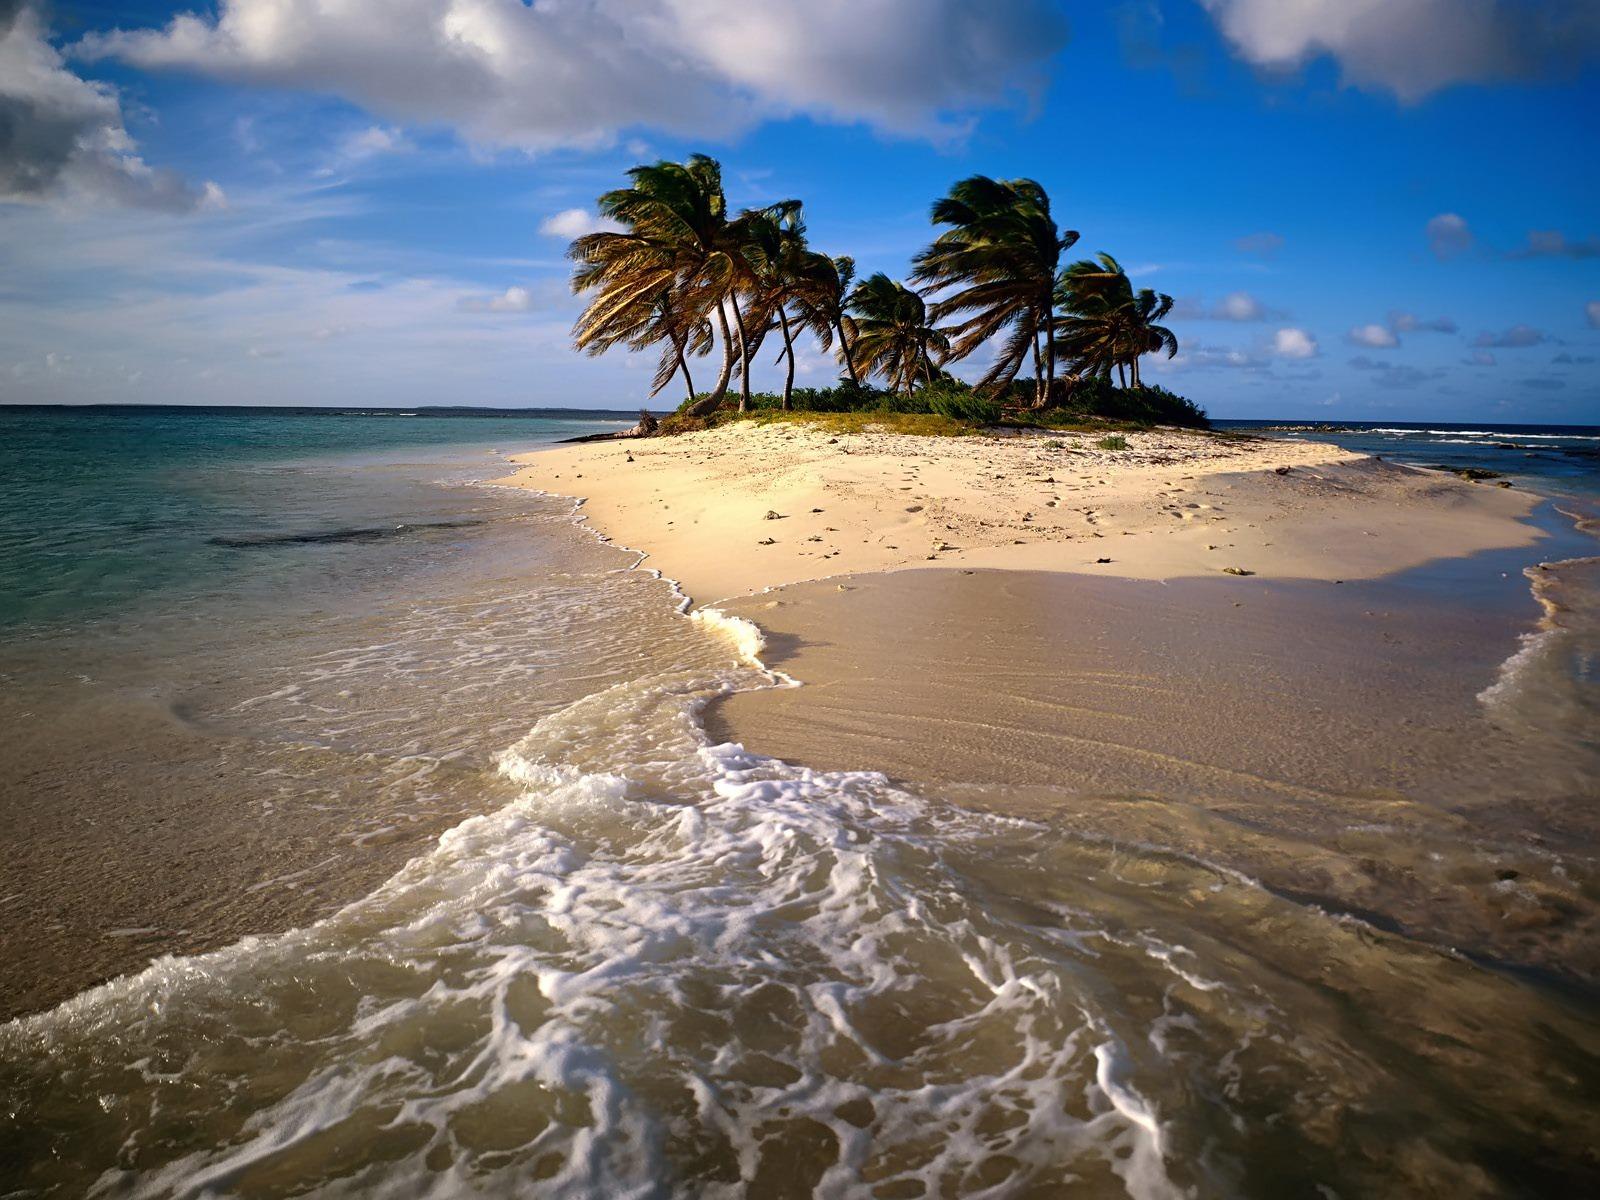 Caribbean Island Wallpaper Beaches Nature Wallpapers In Jpg